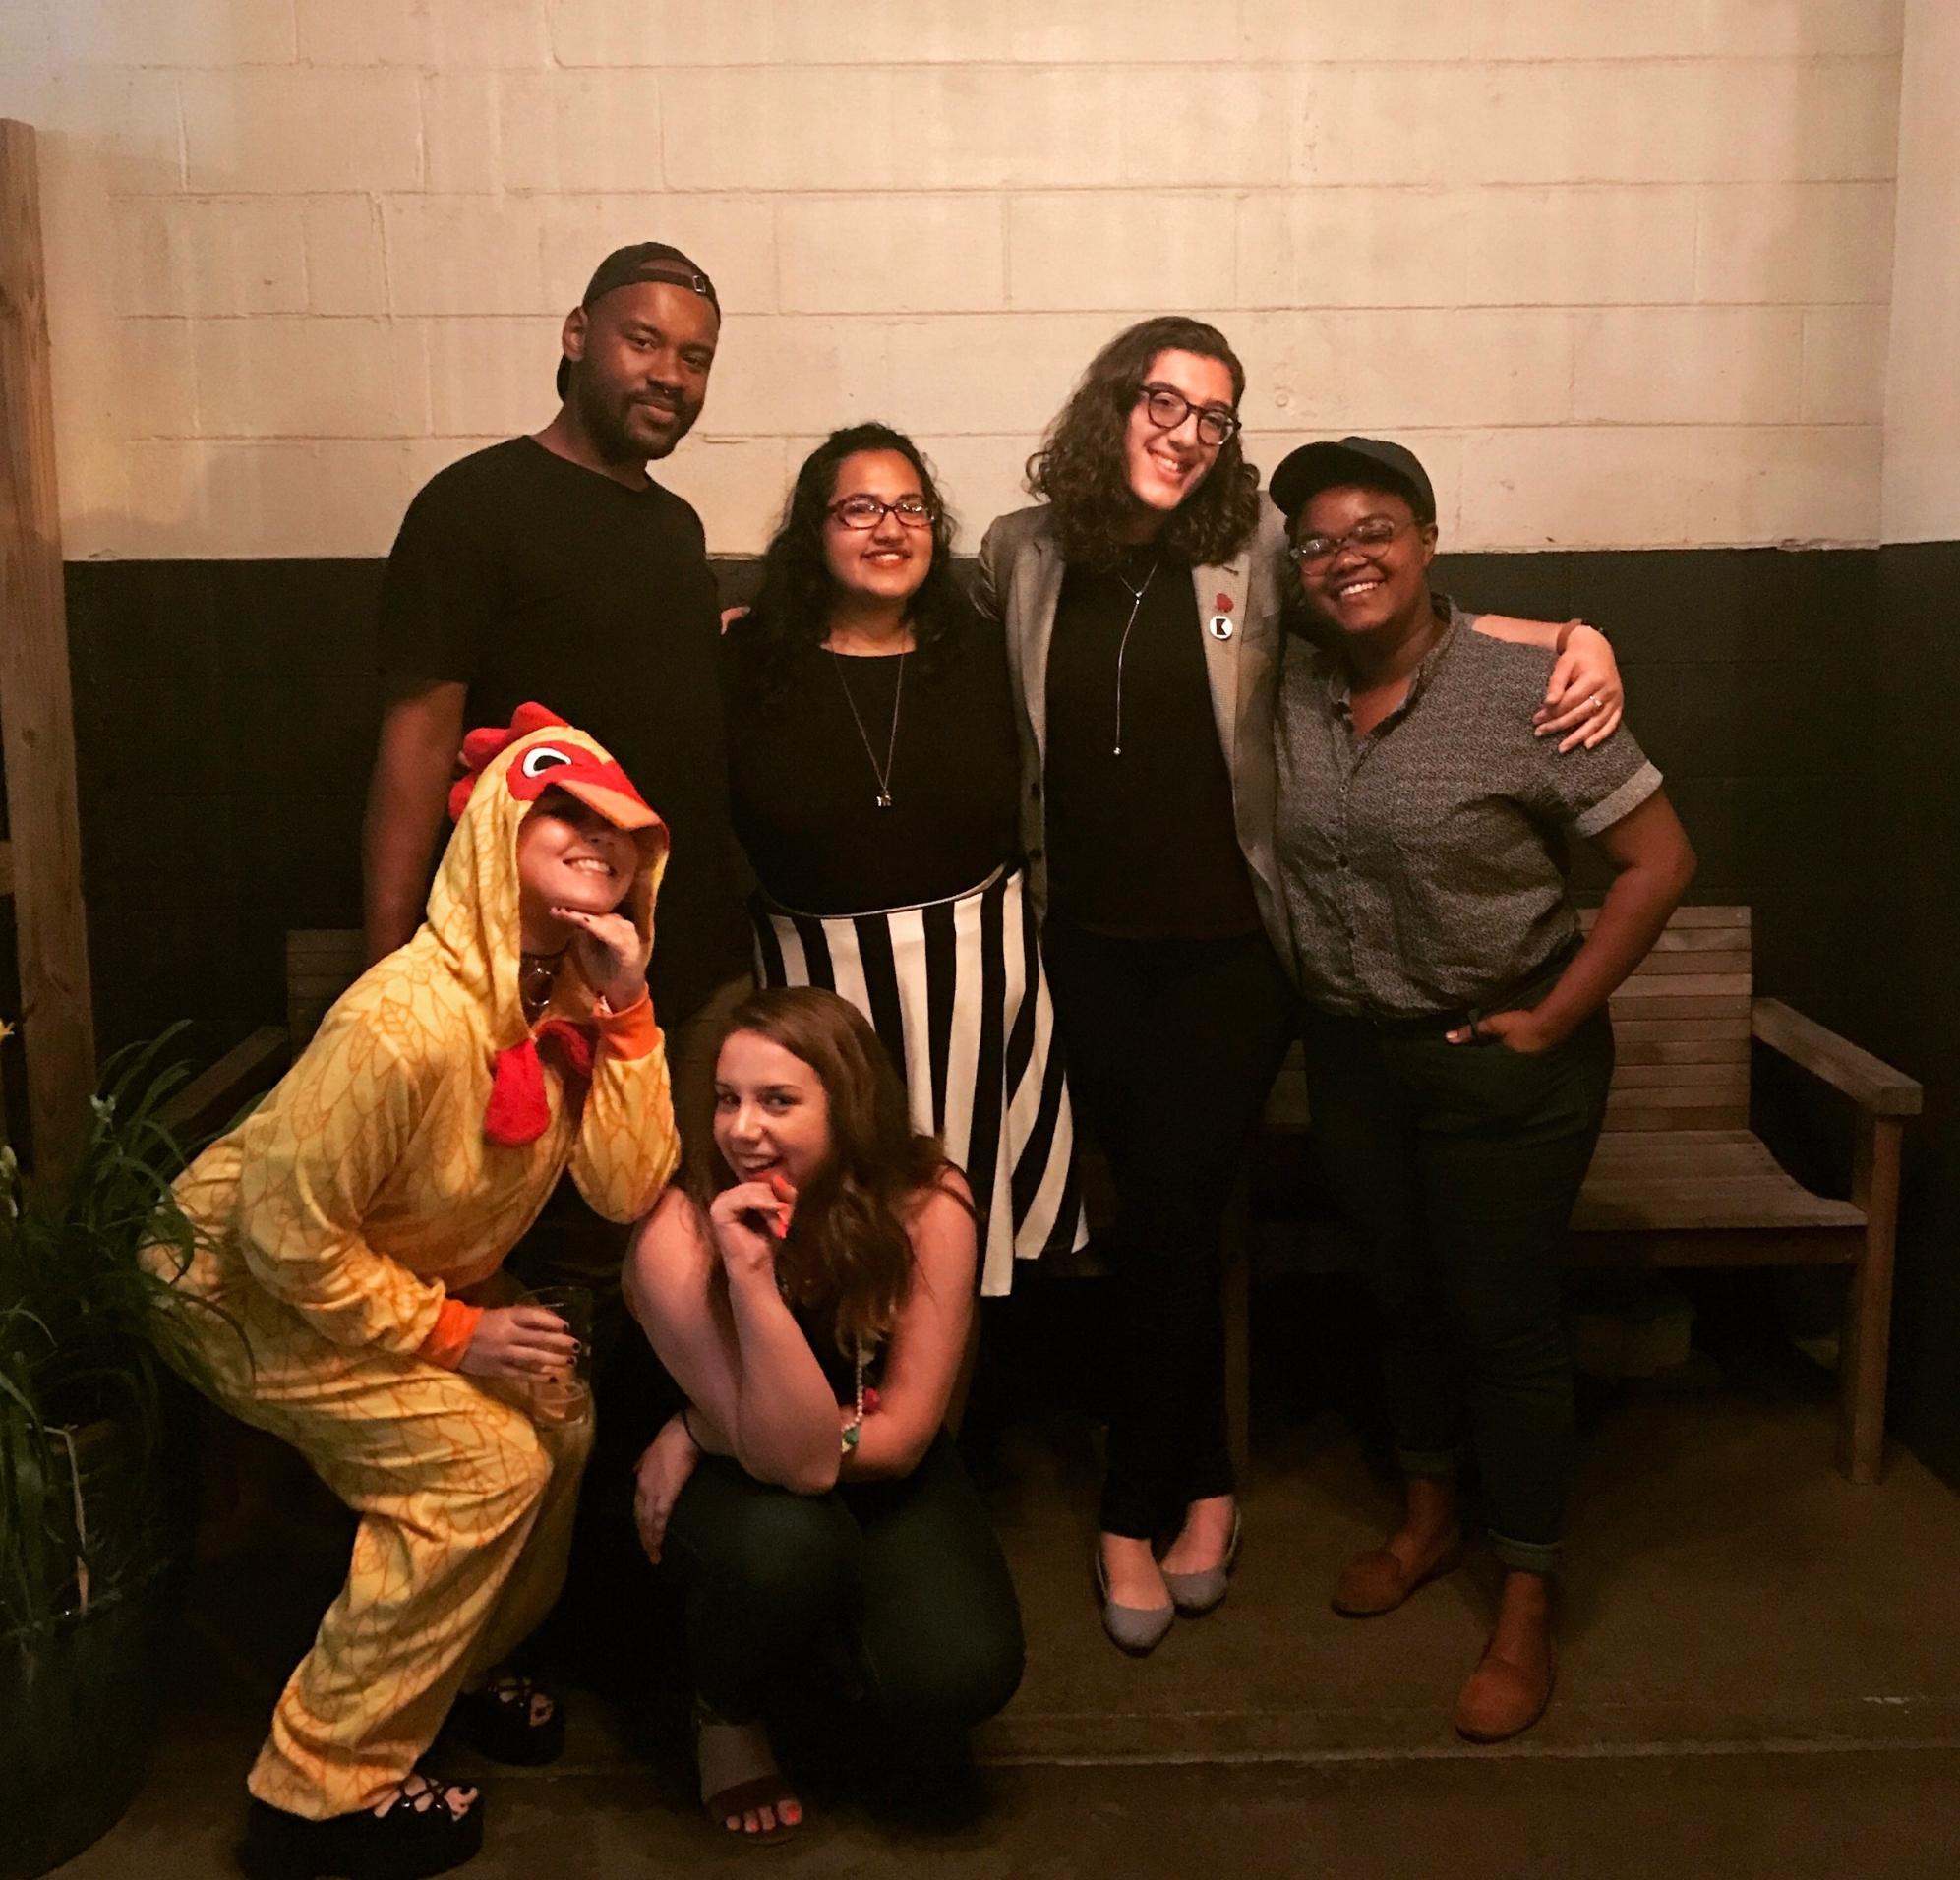 Back, L-R: Donovan Taylor, Zainab Hussain, Meredith Wohl, Alana Harris  Front: Erin Brown, Megan Dunn